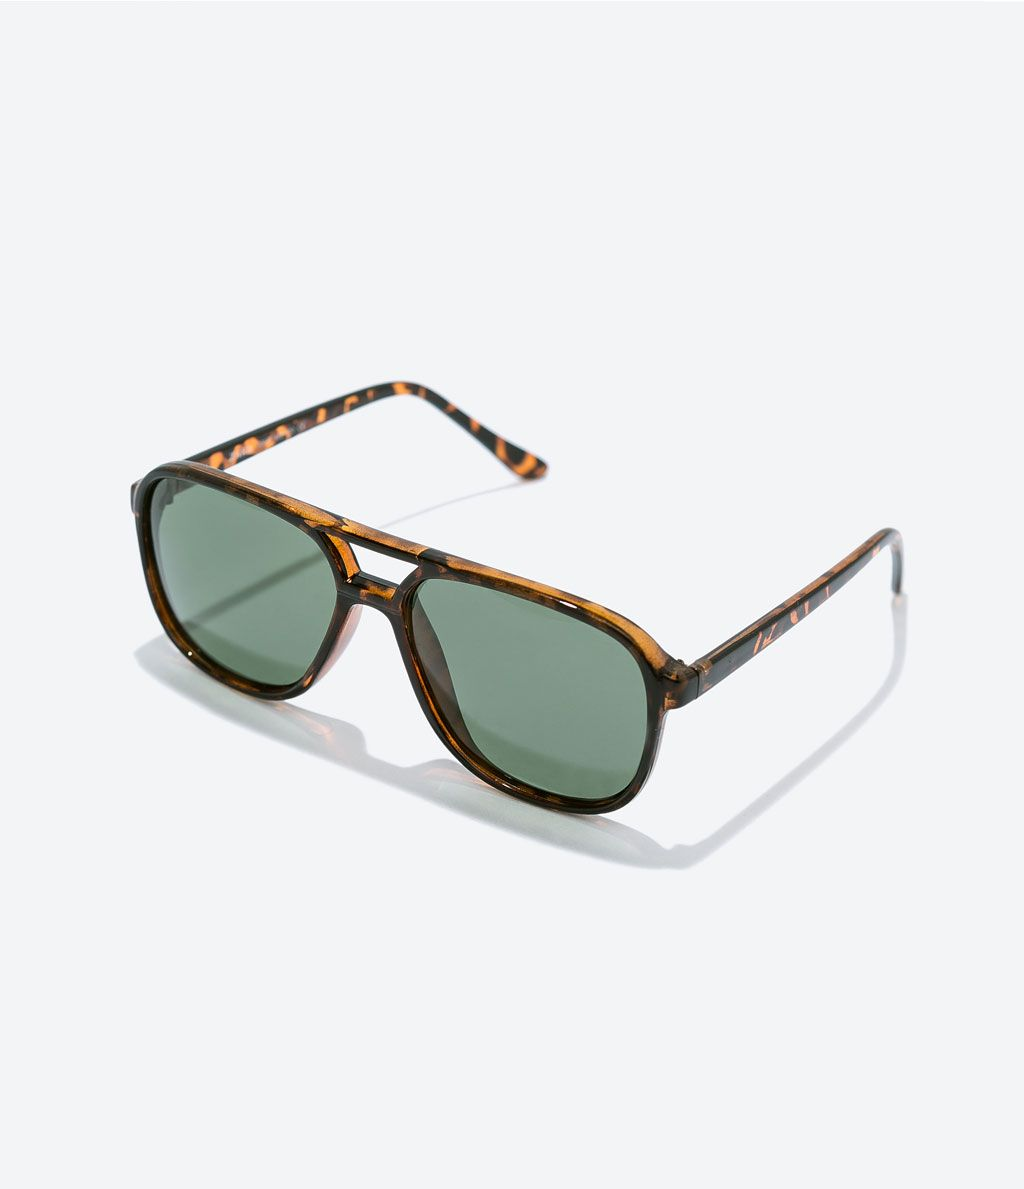 Of Resin From Sunglasses Image 2 Framed ZaraPaulo zVpGMSUq